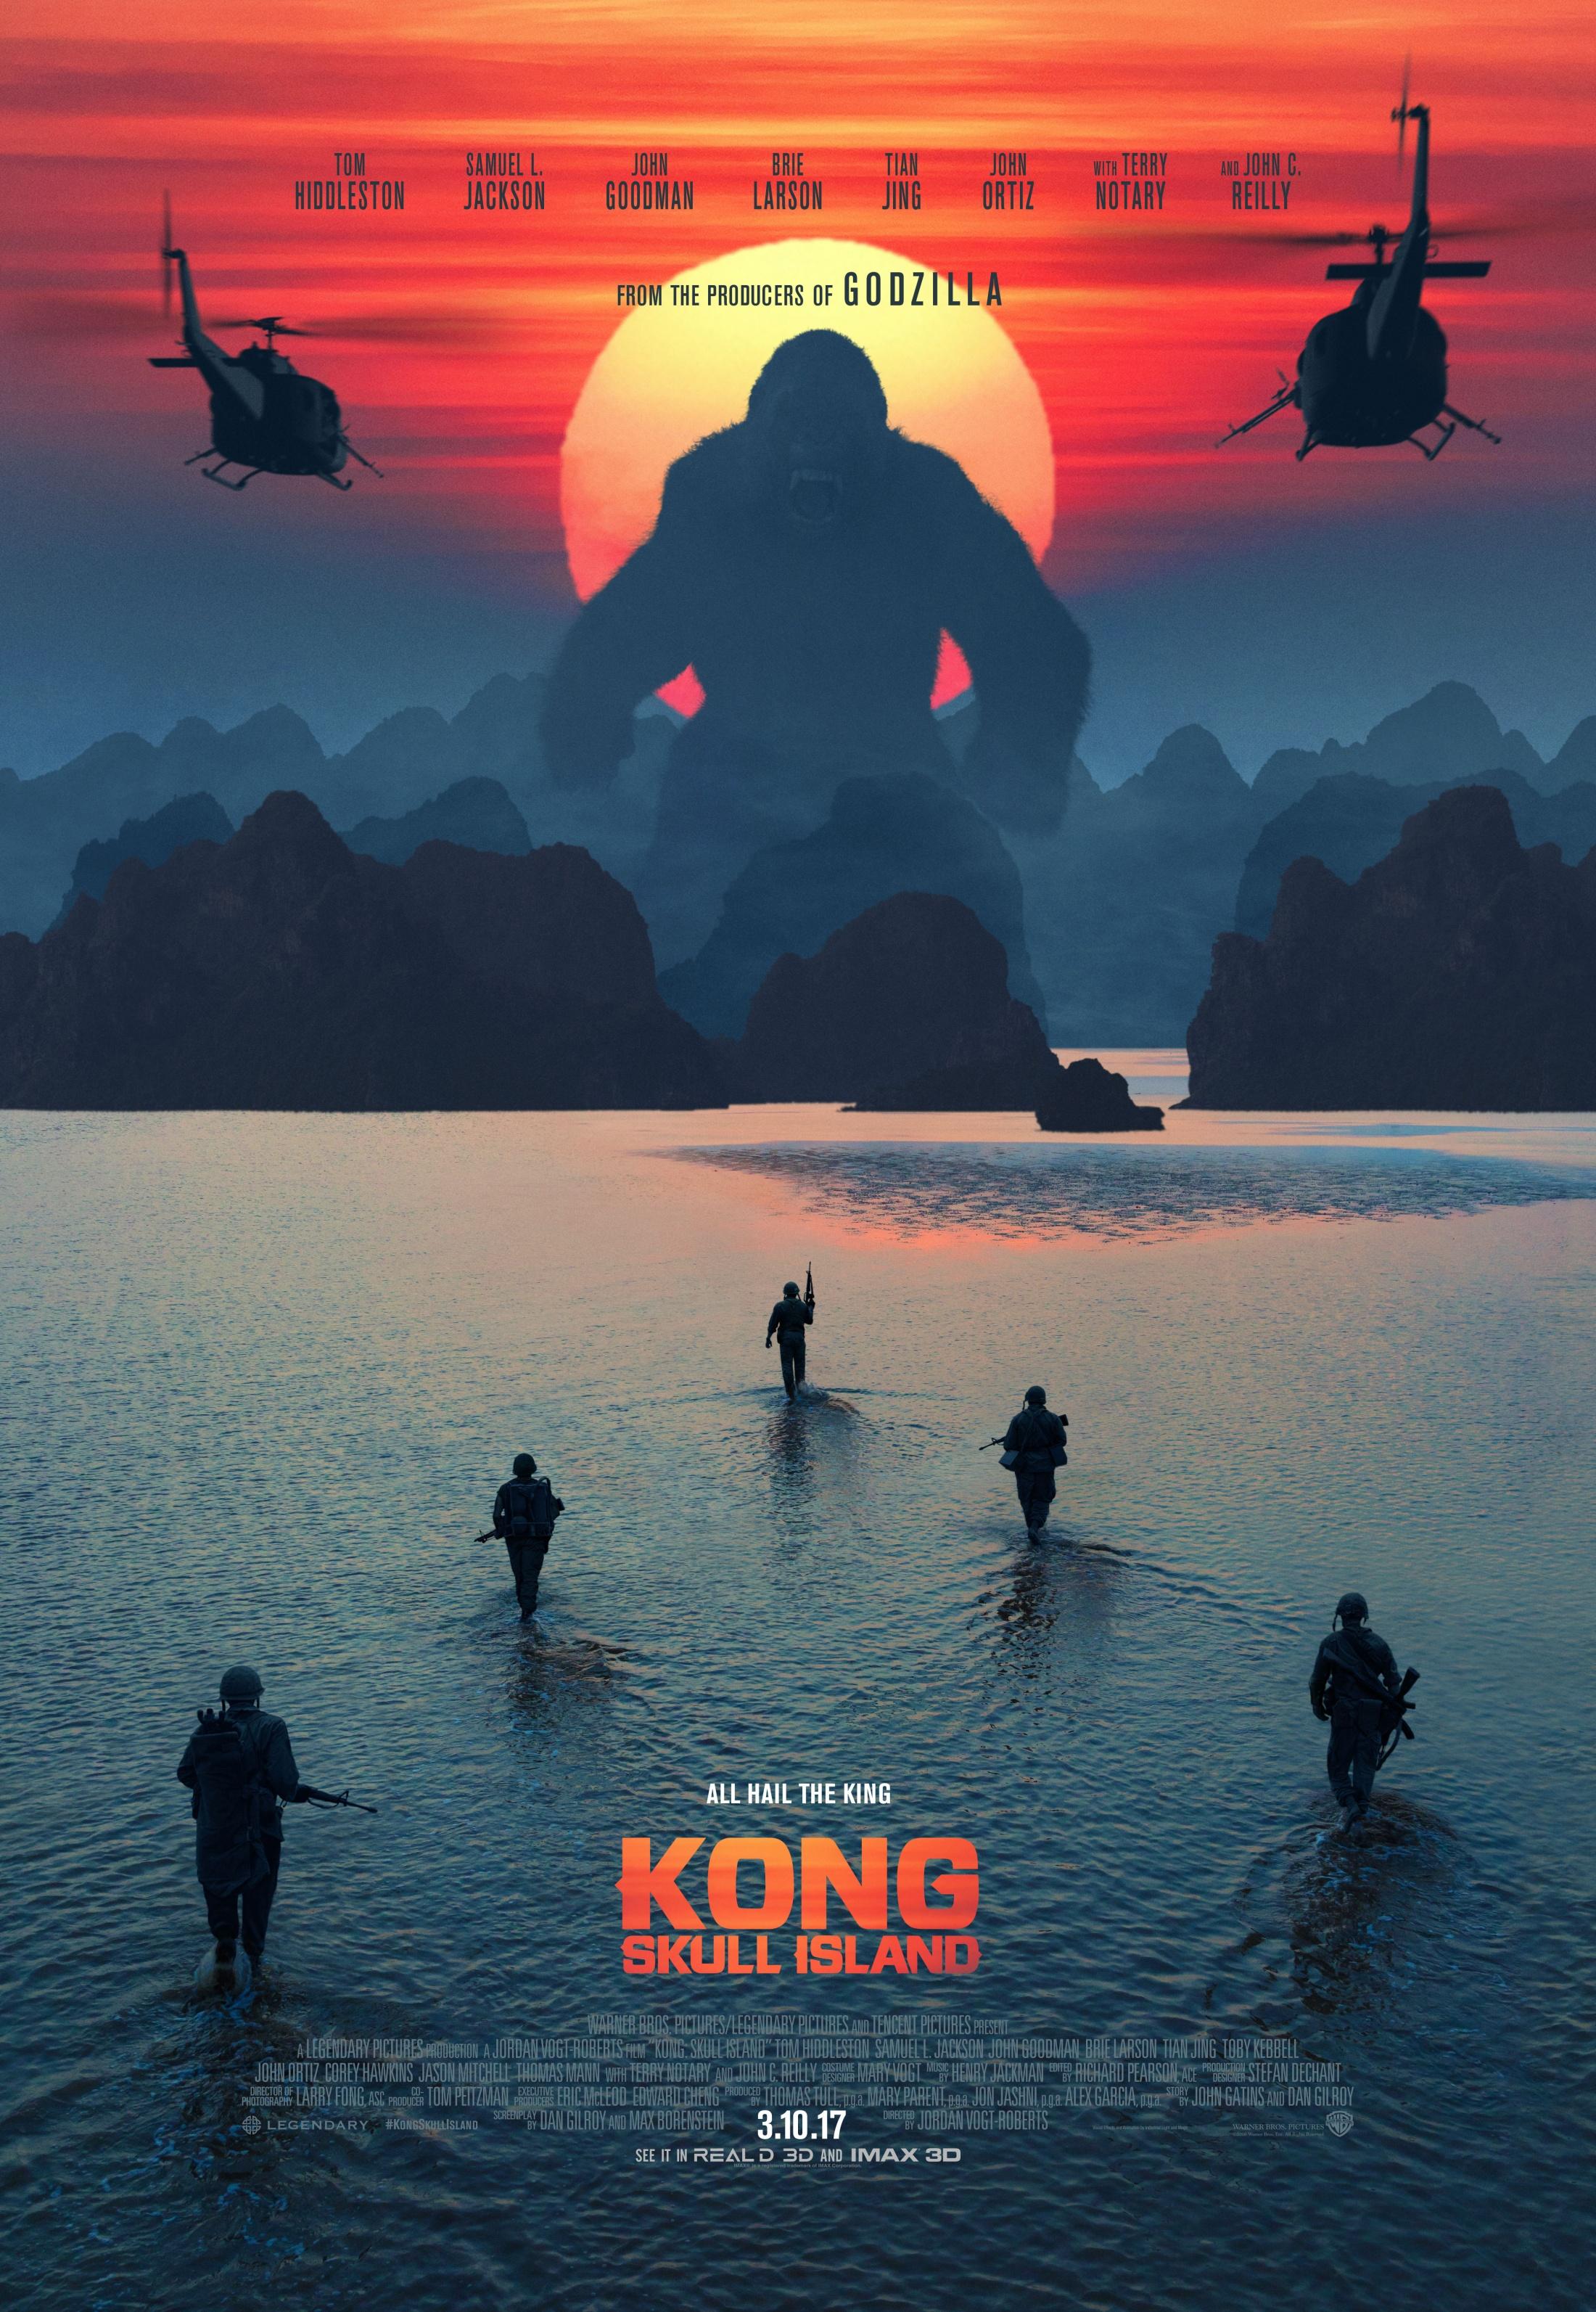 Thumbnail for Kong Teaser 1-Sheet